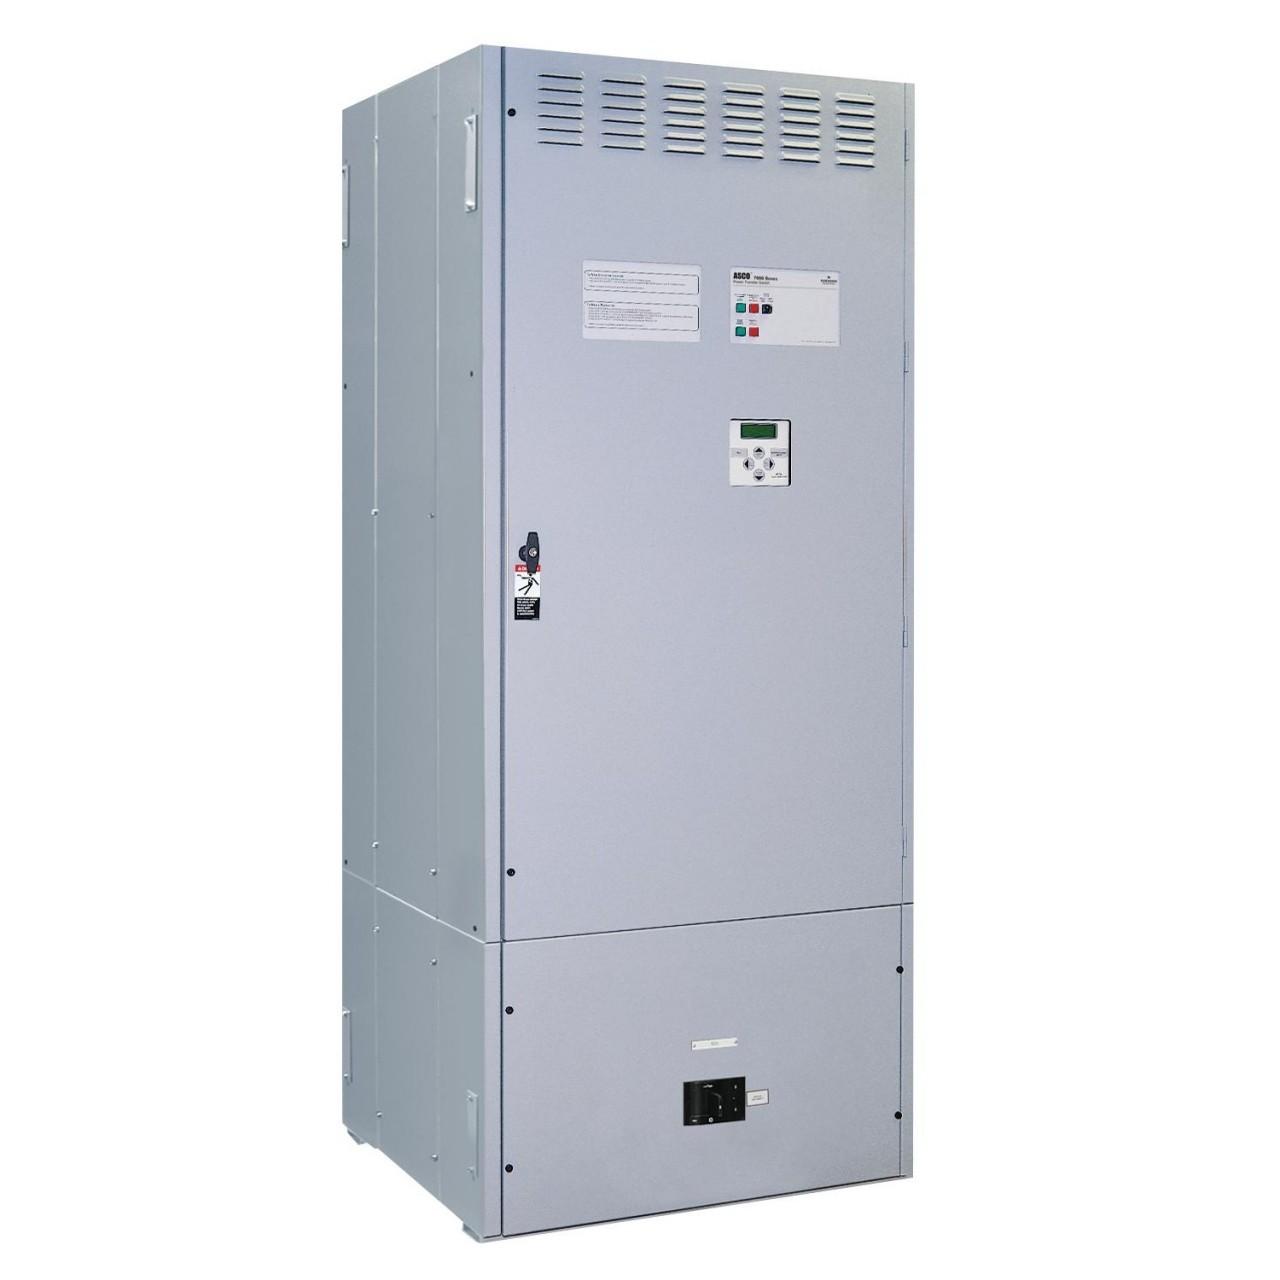 Asco 7000SE Auto Transfer Switch (1Ph, 1600A)